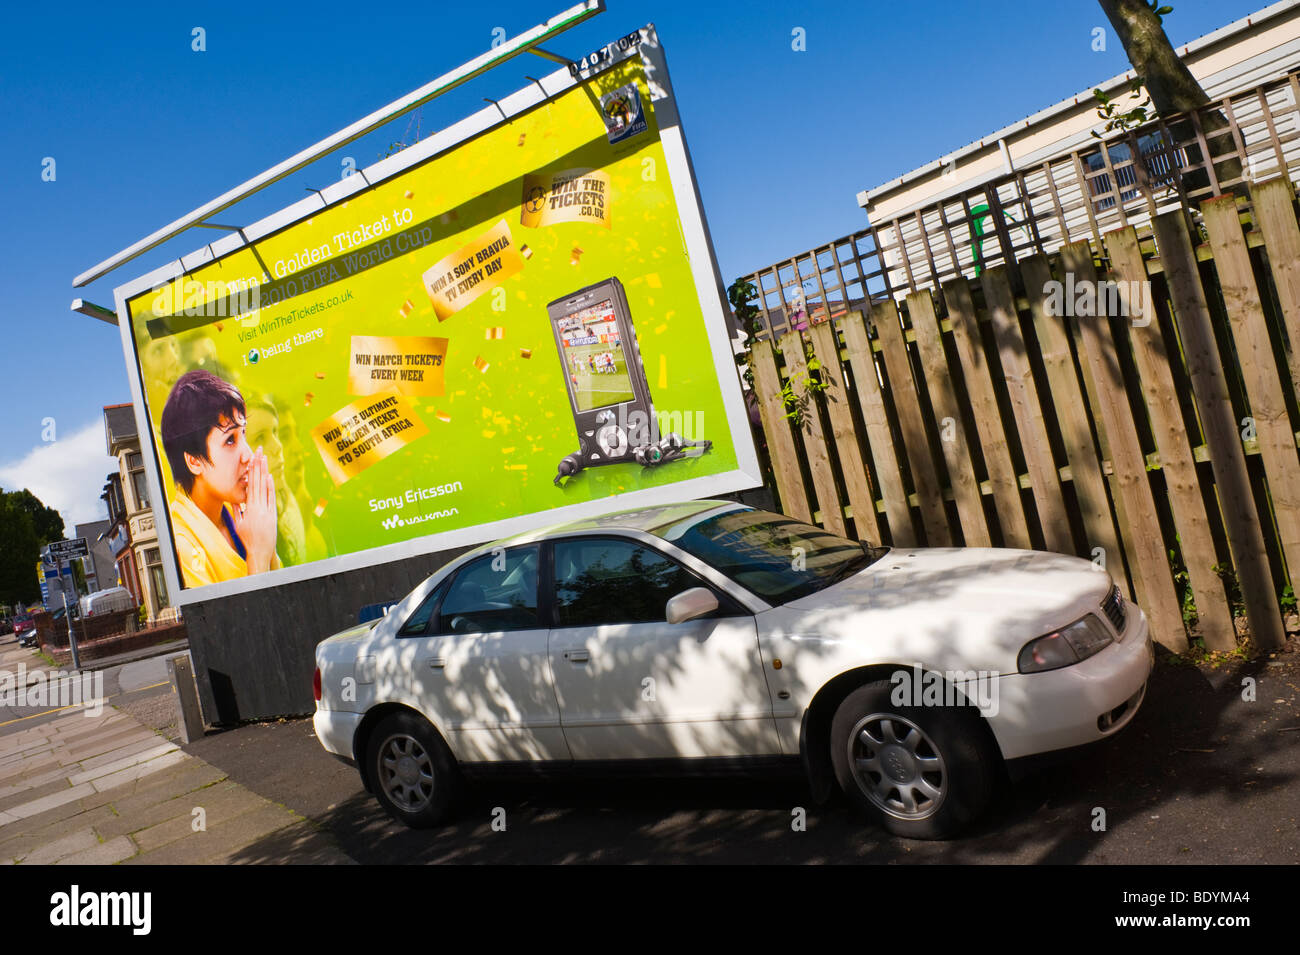 JCDecaux billboard for Sony Ericsson Walkman in UK - Stock Image